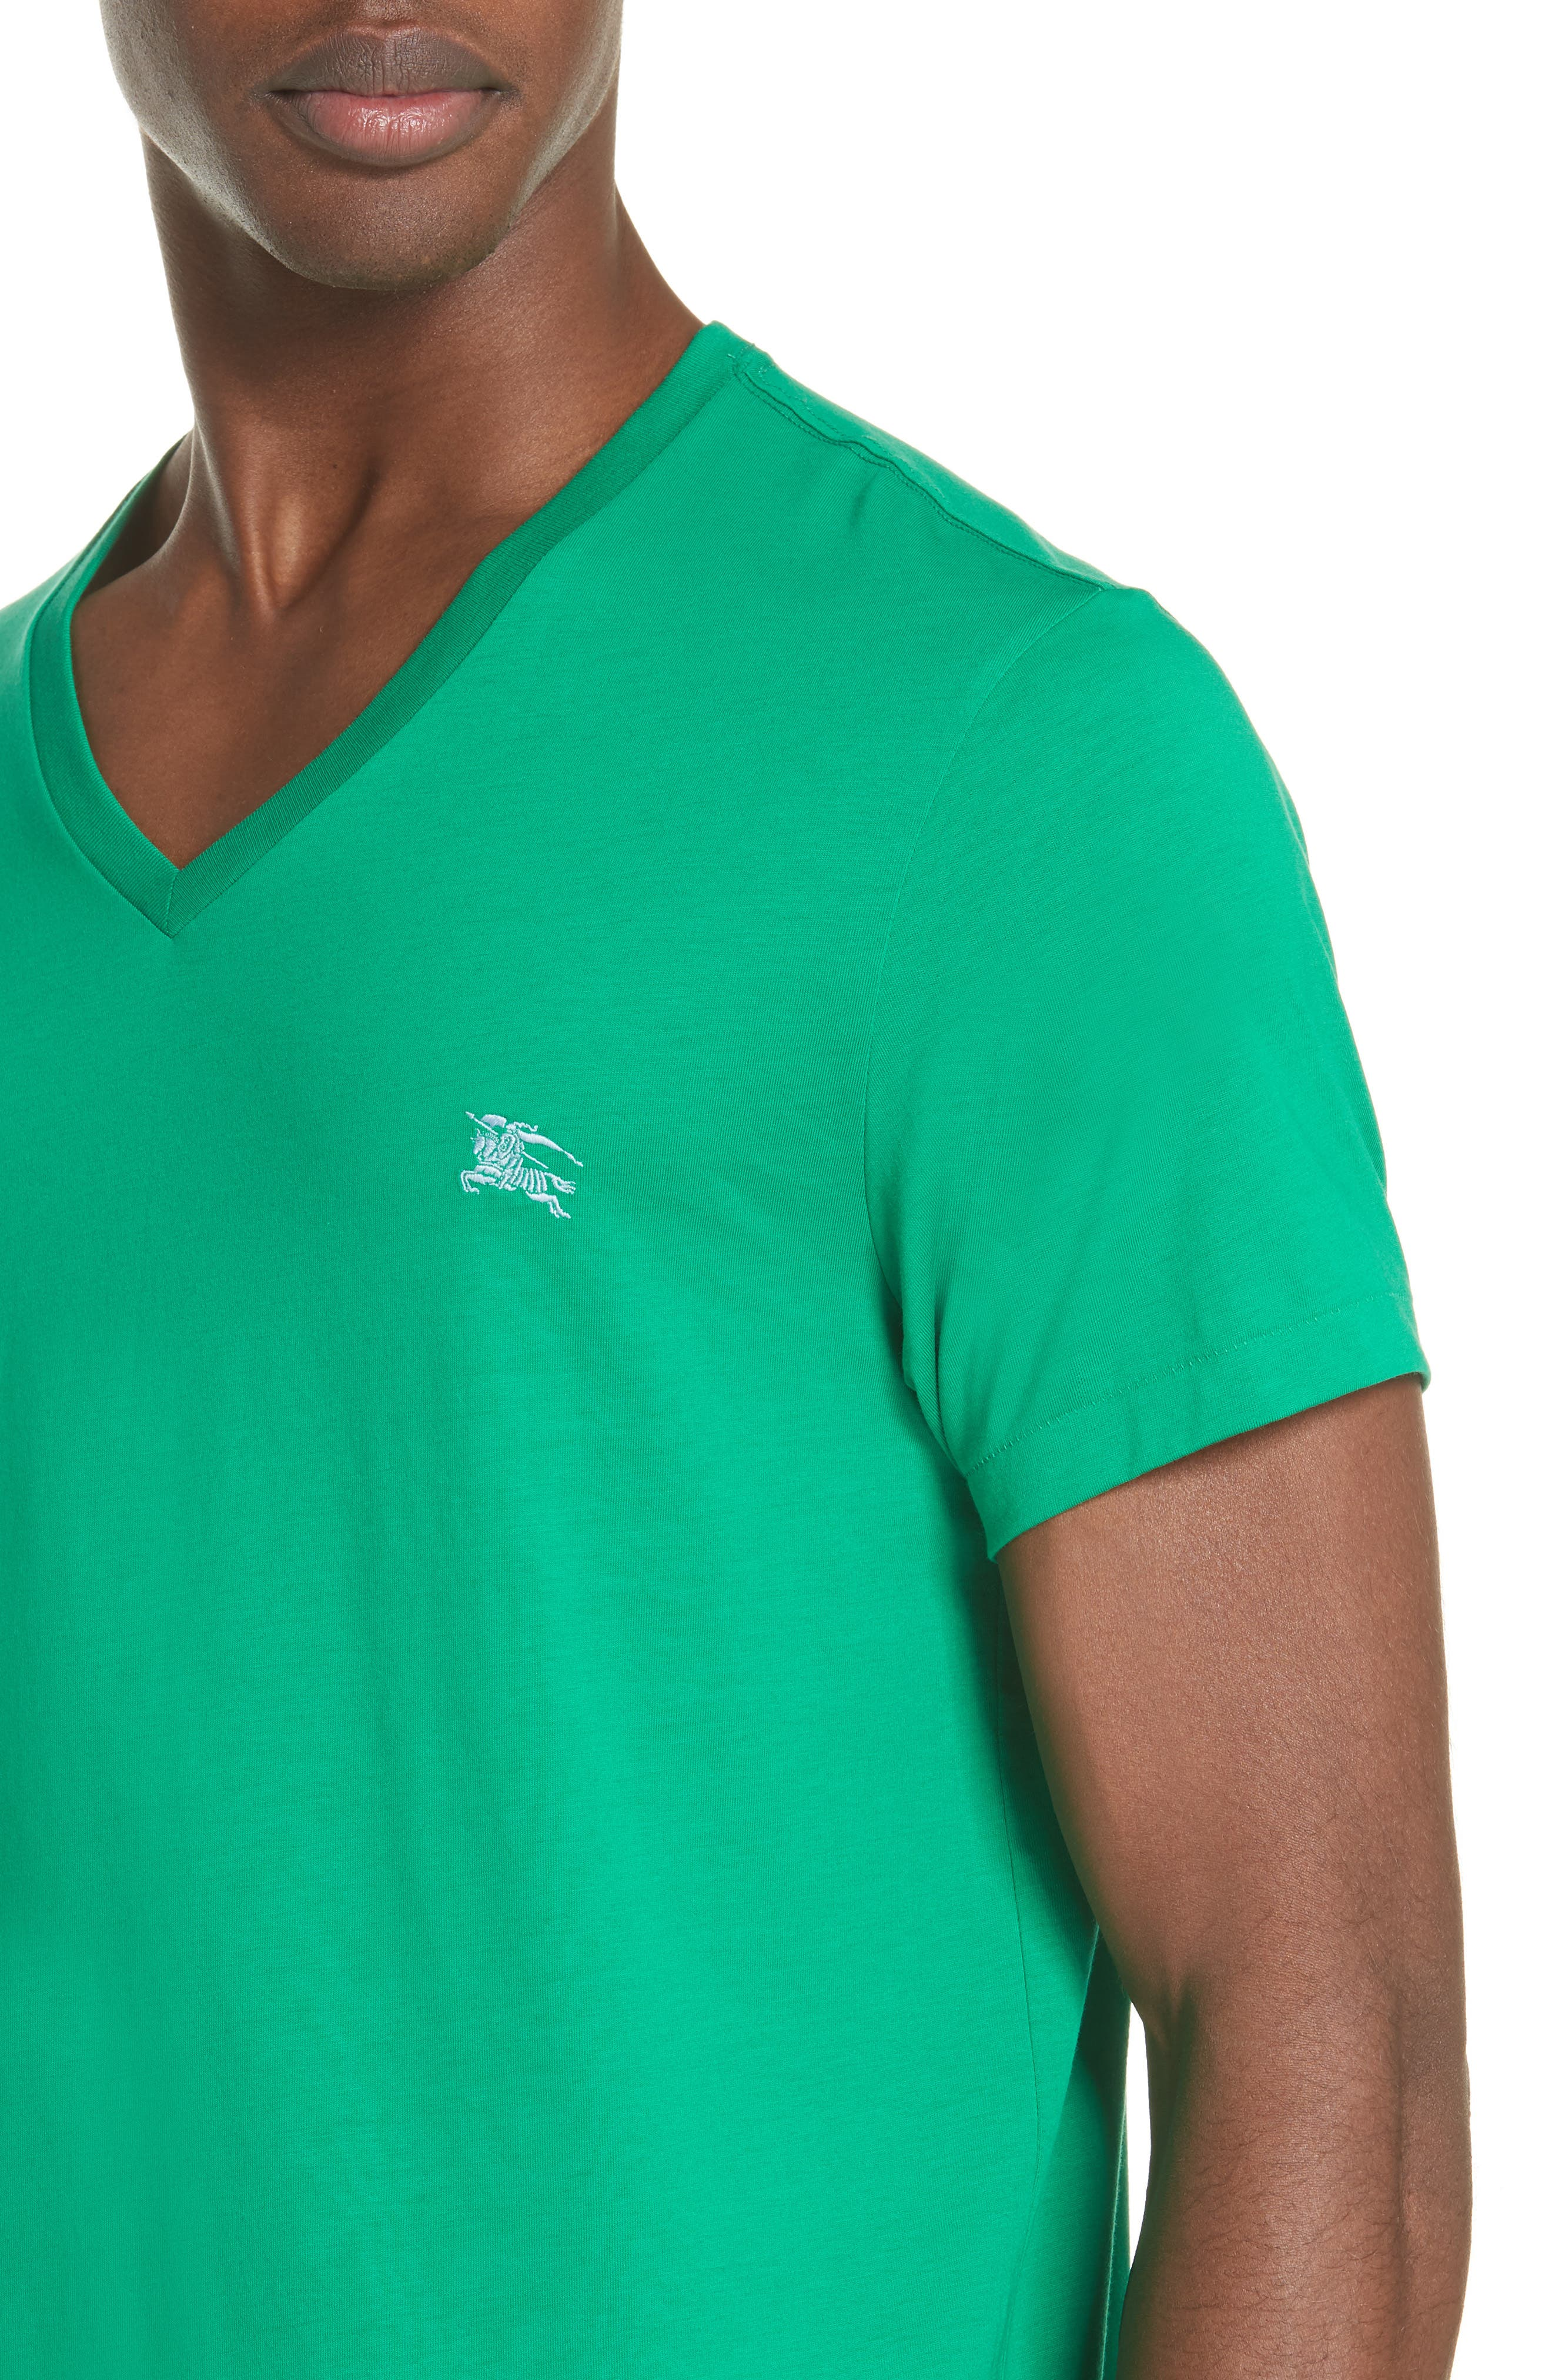 Jadford V-Neck T-Shirt,                             Alternate thumbnail 4, color,                             BRIGHT GREEN